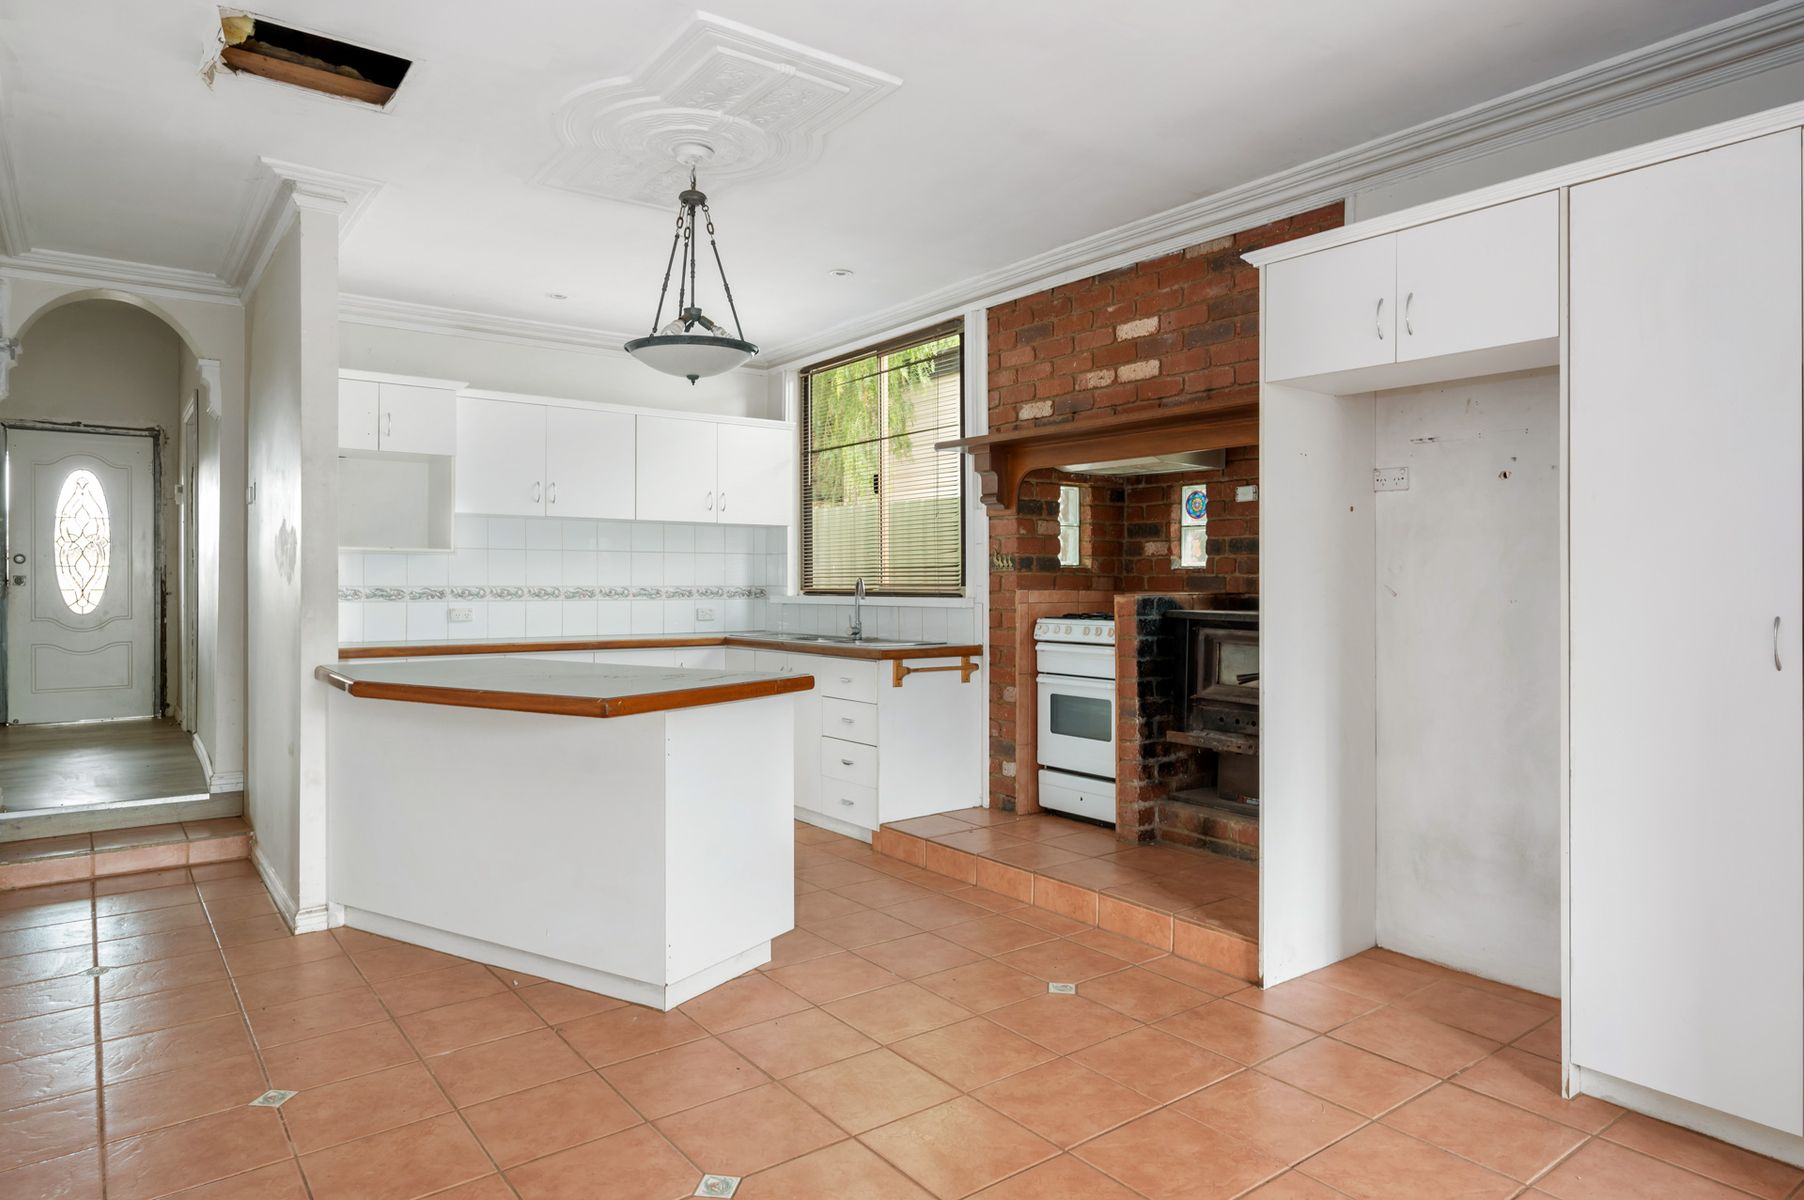 555 Hannan Street, Kalgoorlie, WA 6430